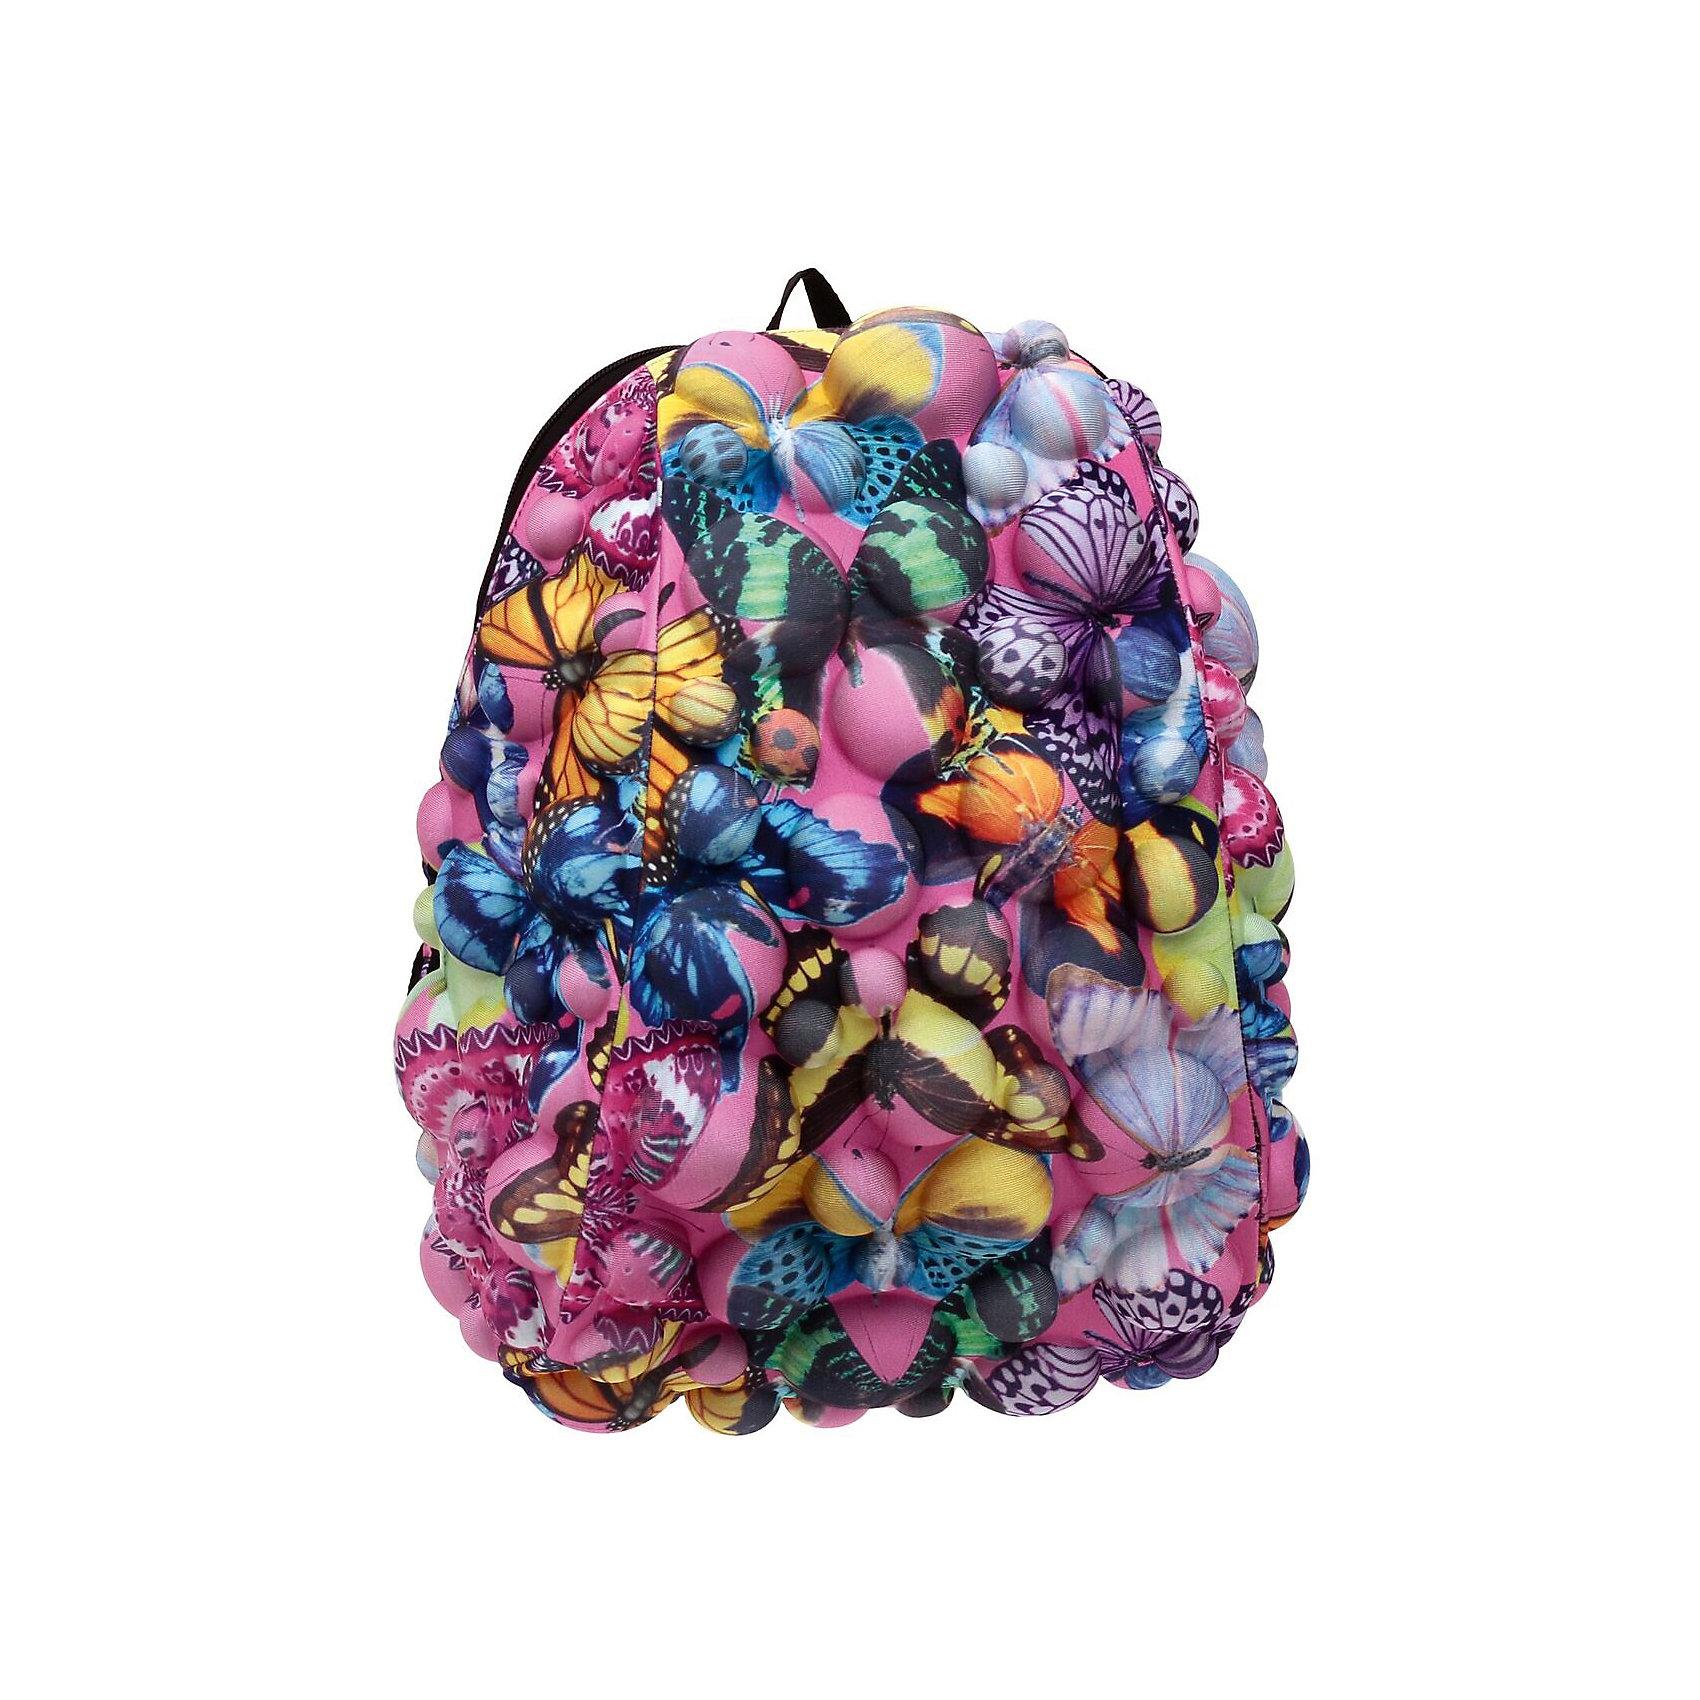 Рюкзак Bubble Half Butterfly, цвет мультиРюкзаки<br>Вес: 0,6 кг<br>Размер: 36х31х15 см<br>Состав: рюкзак<br>Наличие светоотражающих элементов: нет<br>Материал: полиспандекс<br><br>Ширина мм: 360<br>Глубина мм: 310<br>Высота мм: 150<br>Вес г: 600<br>Возраст от месяцев: 36<br>Возраст до месяцев: 720<br>Пол: Унисекс<br>Возраст: Детский<br>SKU: 7054057